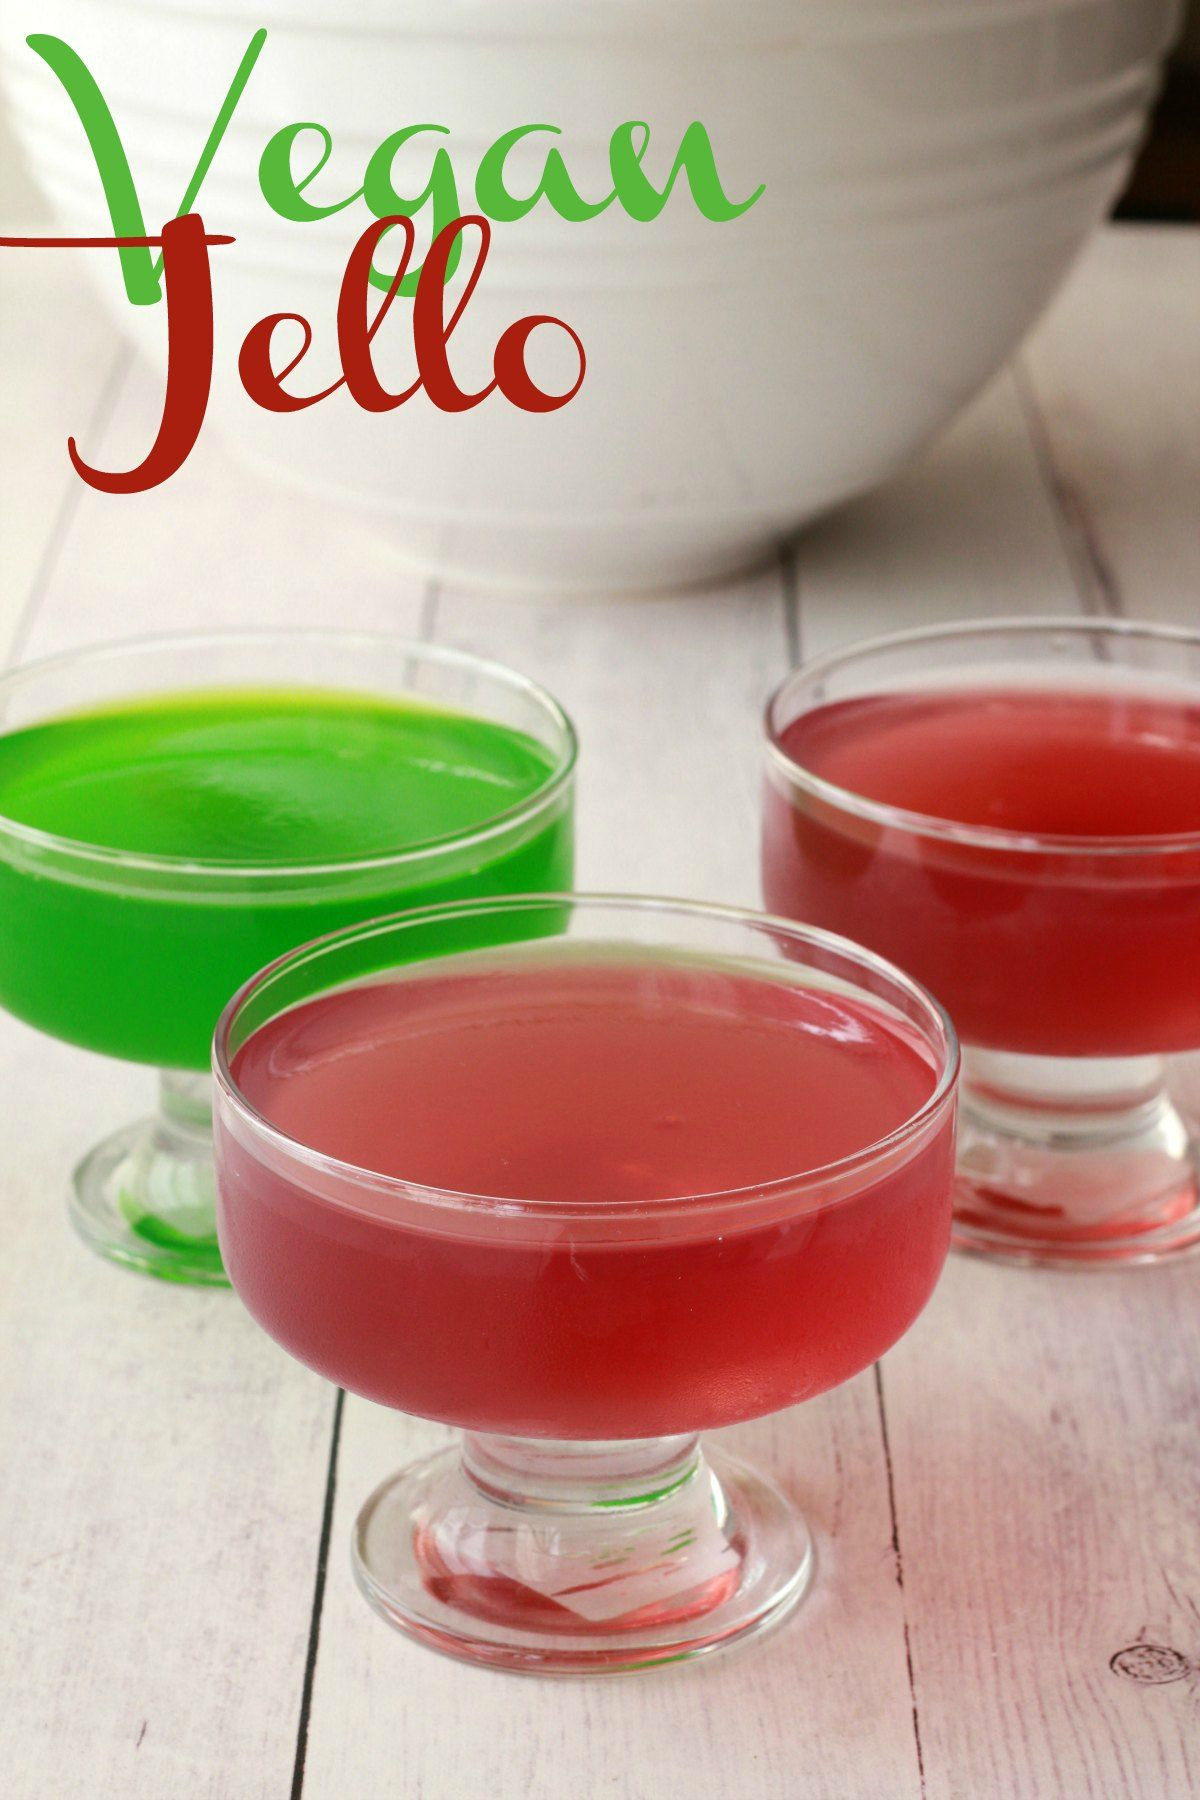 Vegan Jello In Fun And Fruity Red And Green Vegan Lovingitvegan Glutenfree Jello Veganjello Dessert Vegan Jello Vegetarian Jello Vegan Jello Shots